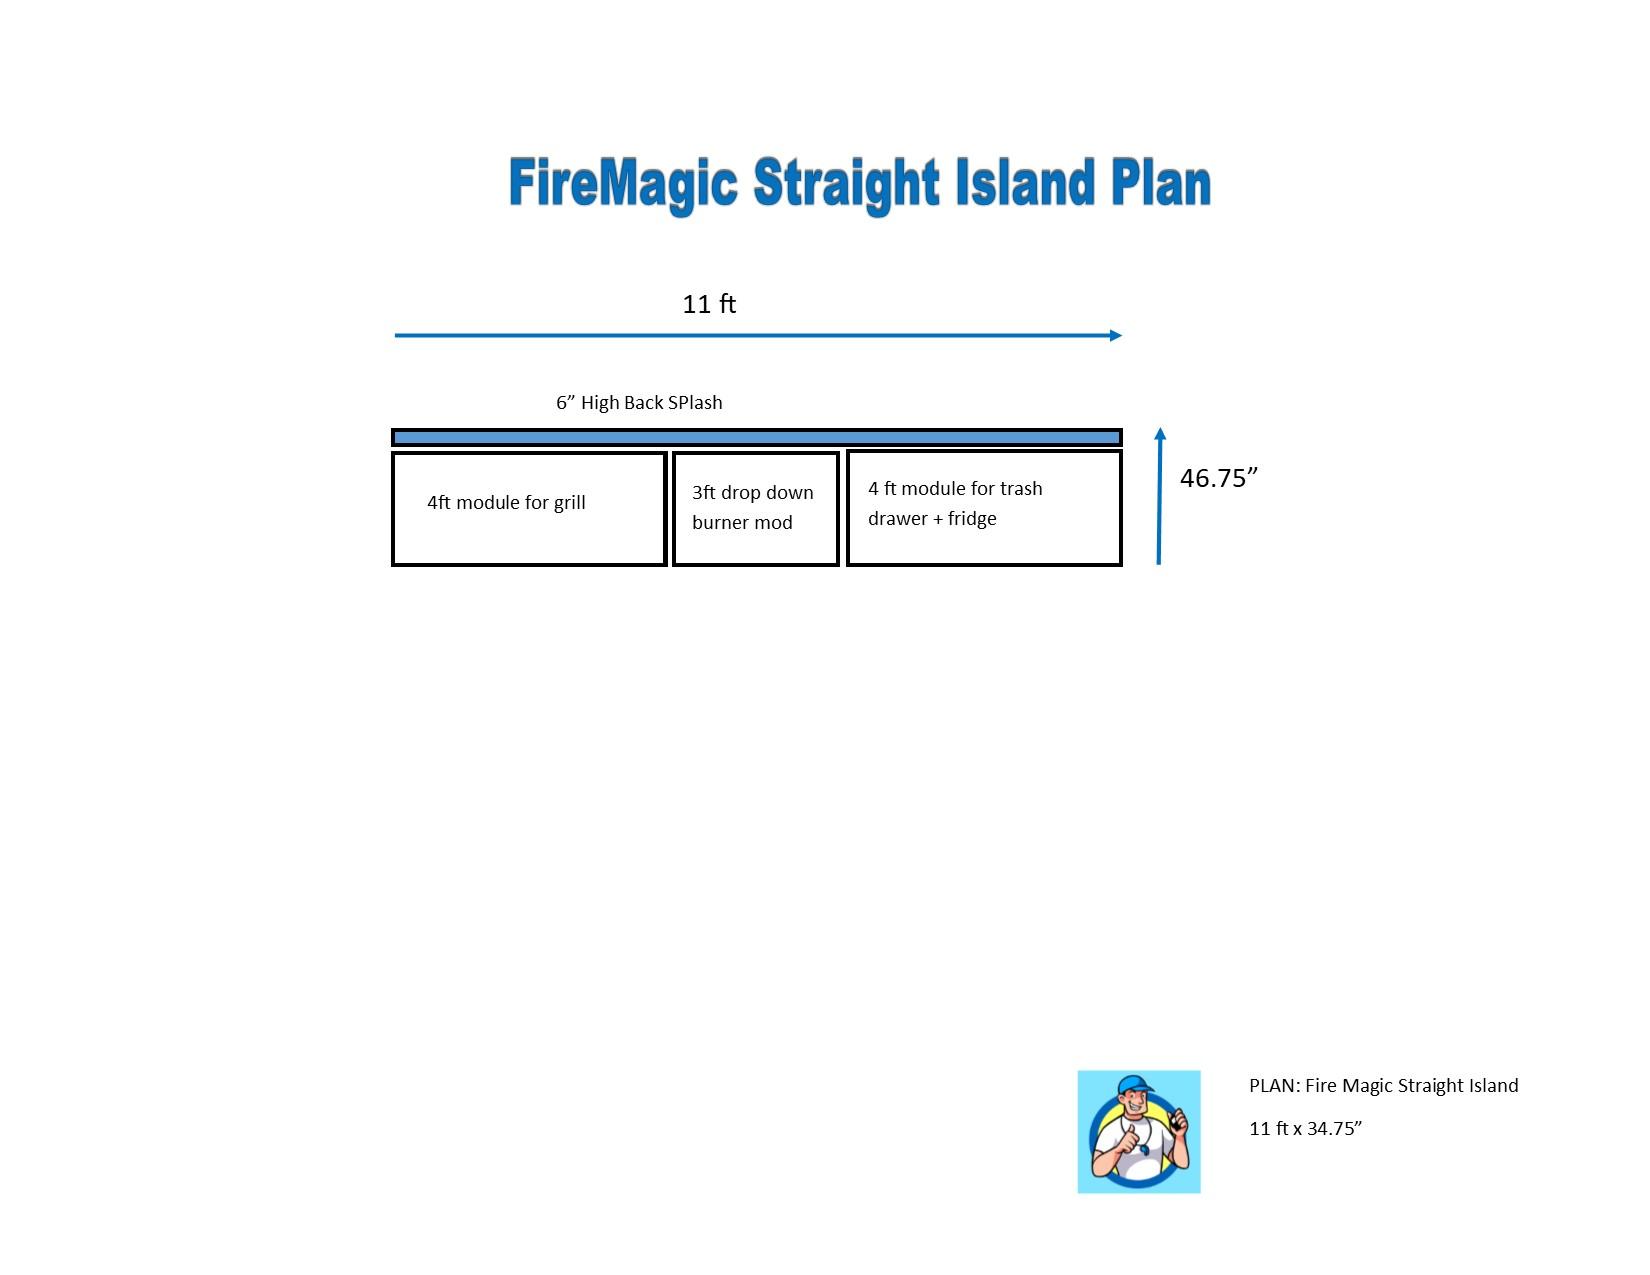 fire-magic-straight-island-plan.jpg